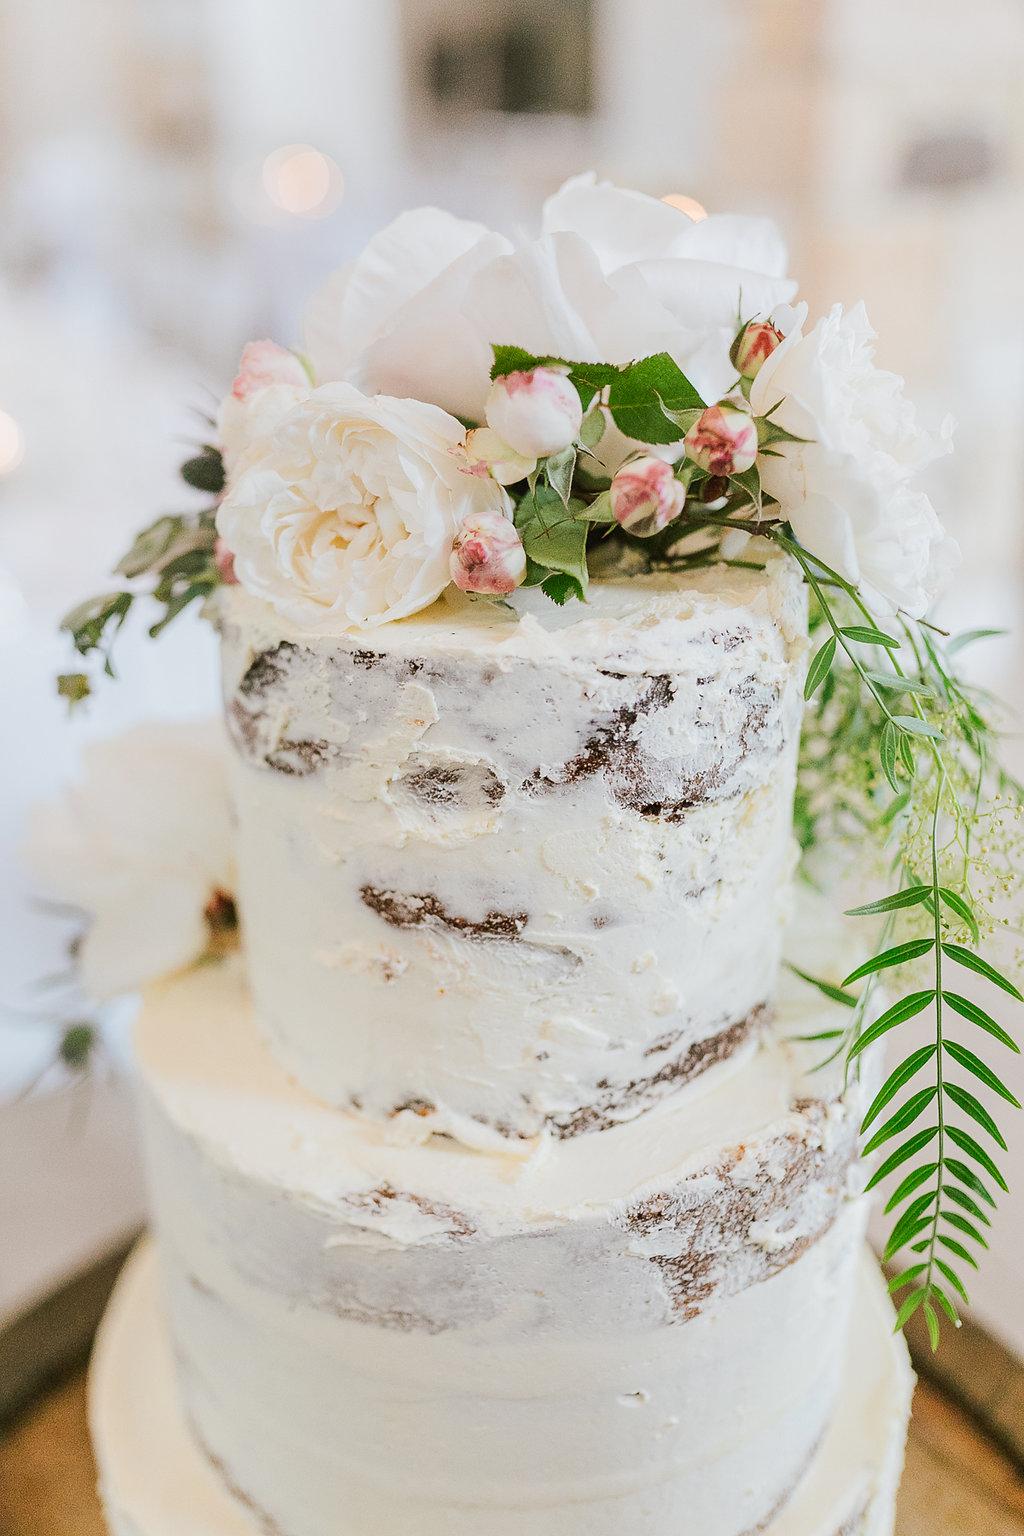 katie_ben_enzo_weddings_ironbark_hill_hunter_valley_gez_xavier_mansfield_photography_2018-490.jpg